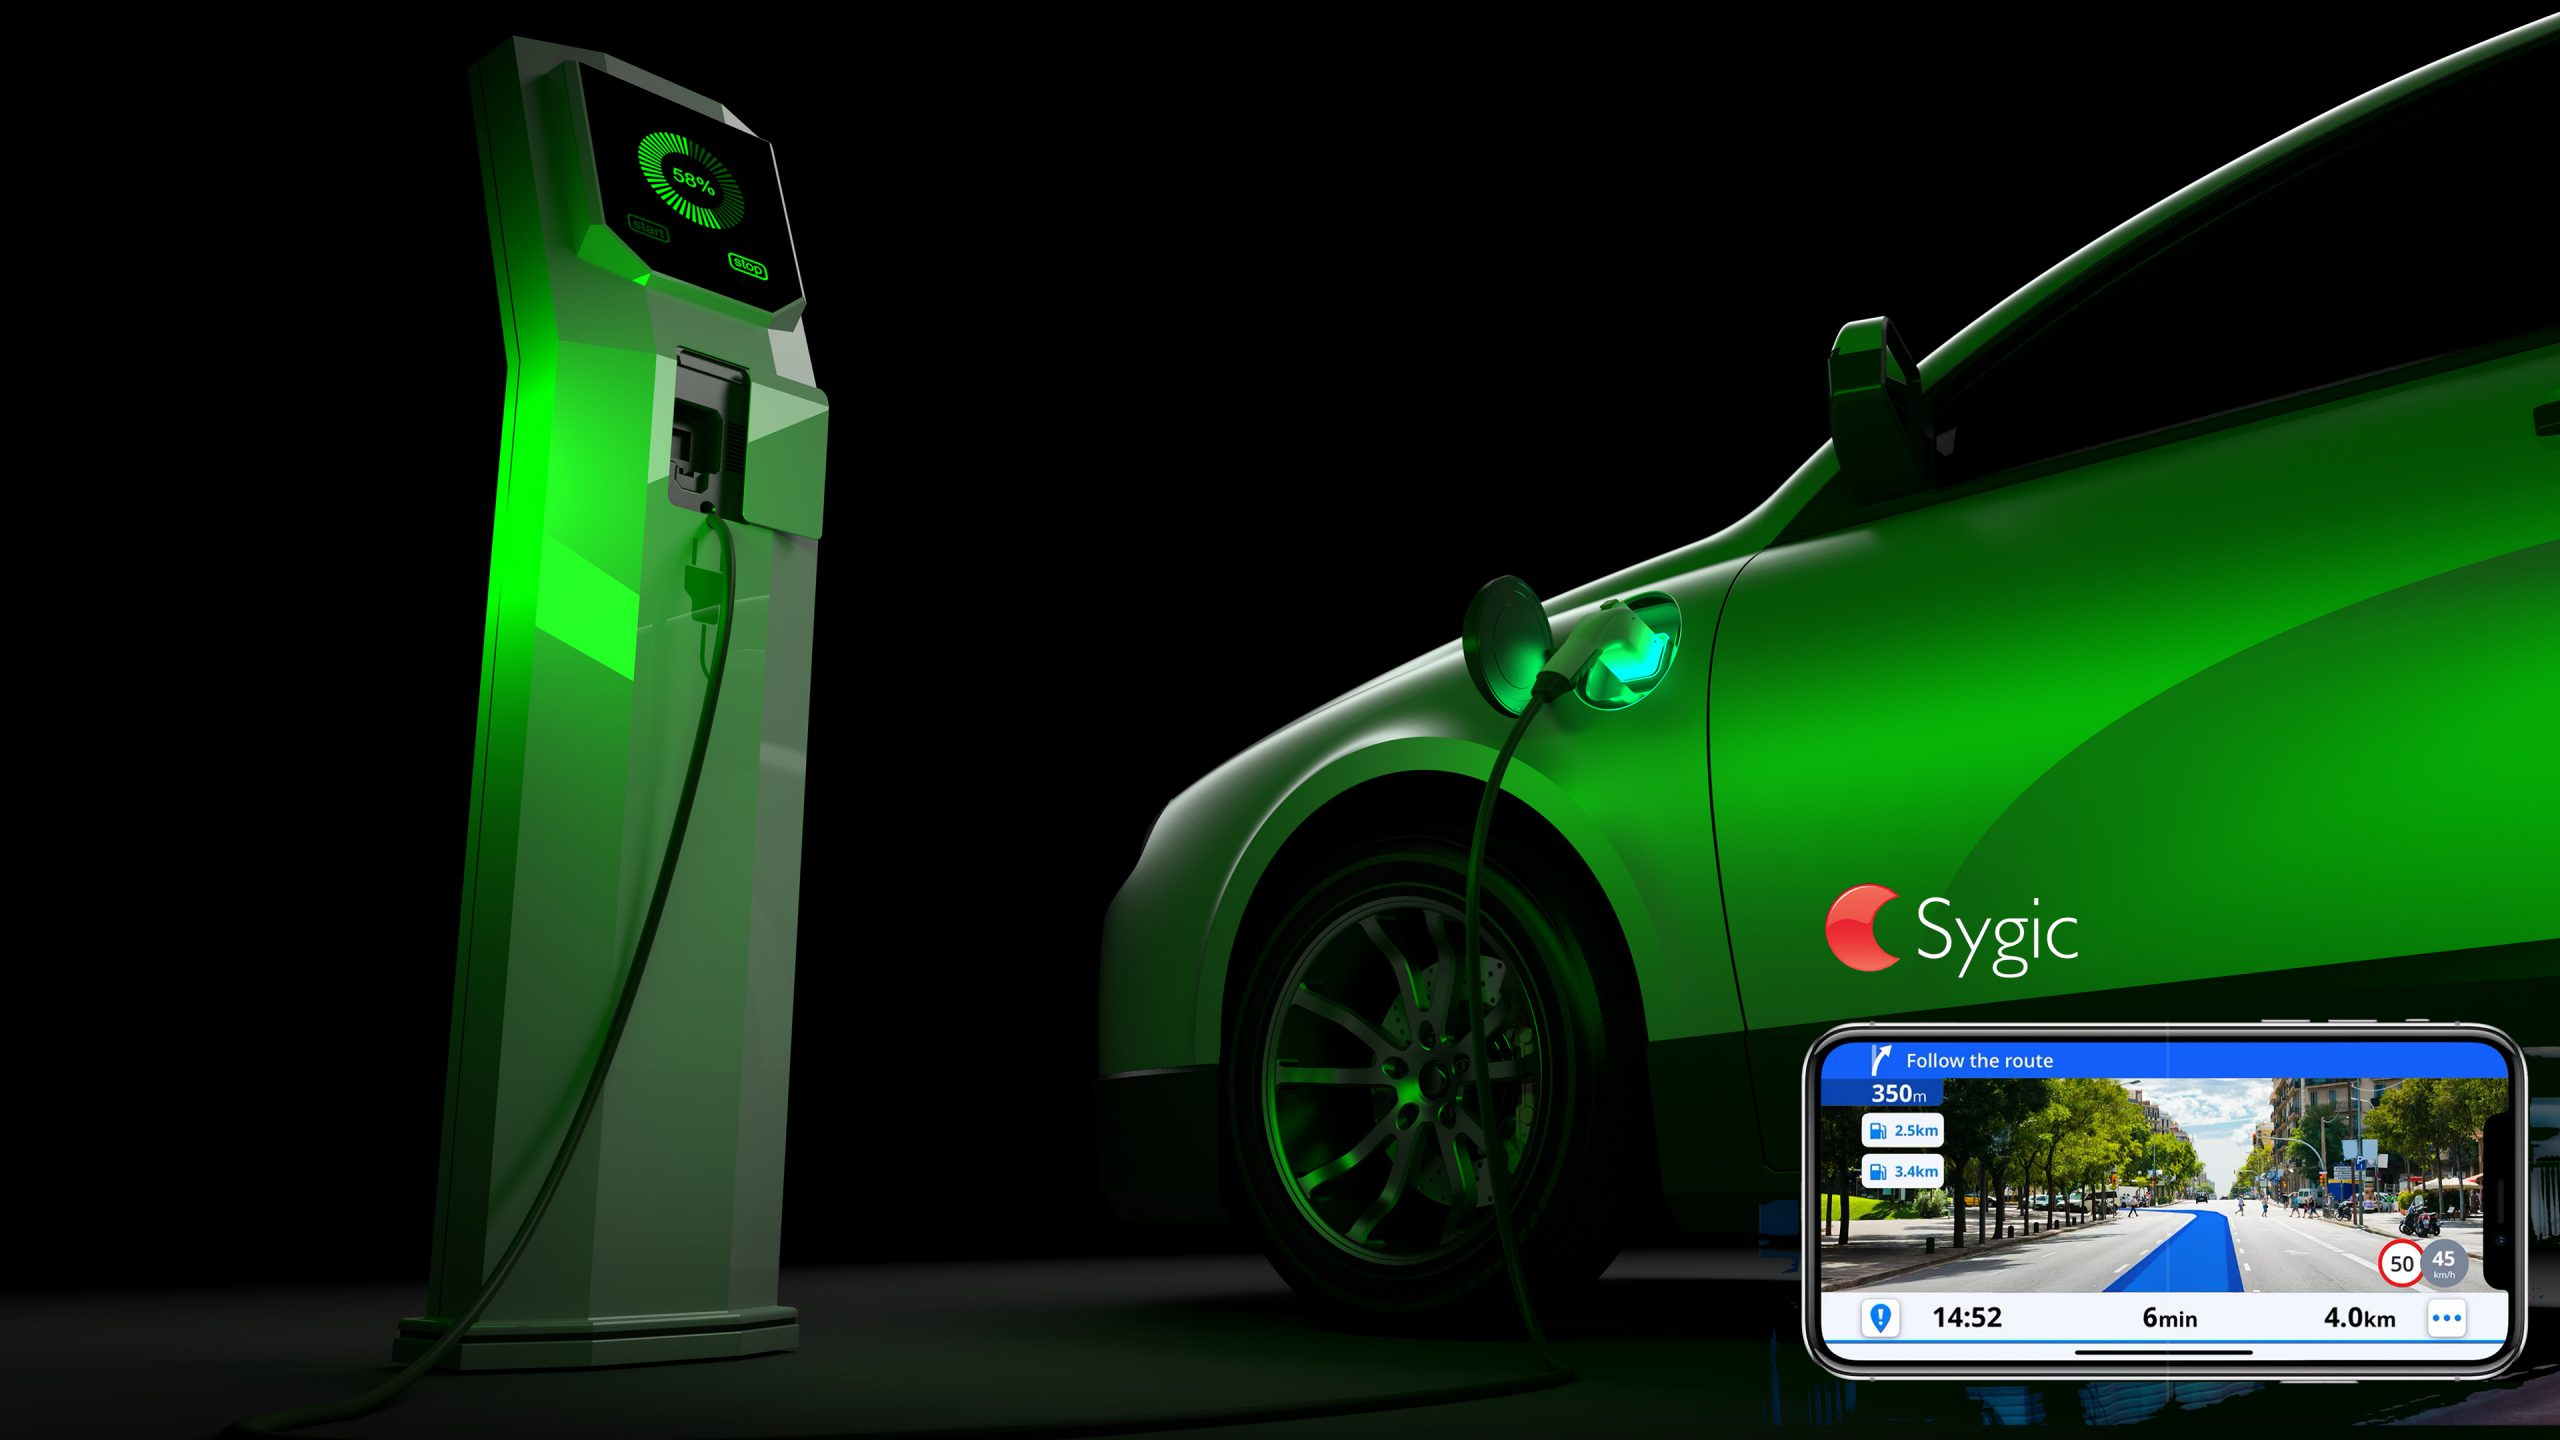 Sygic EV Mode